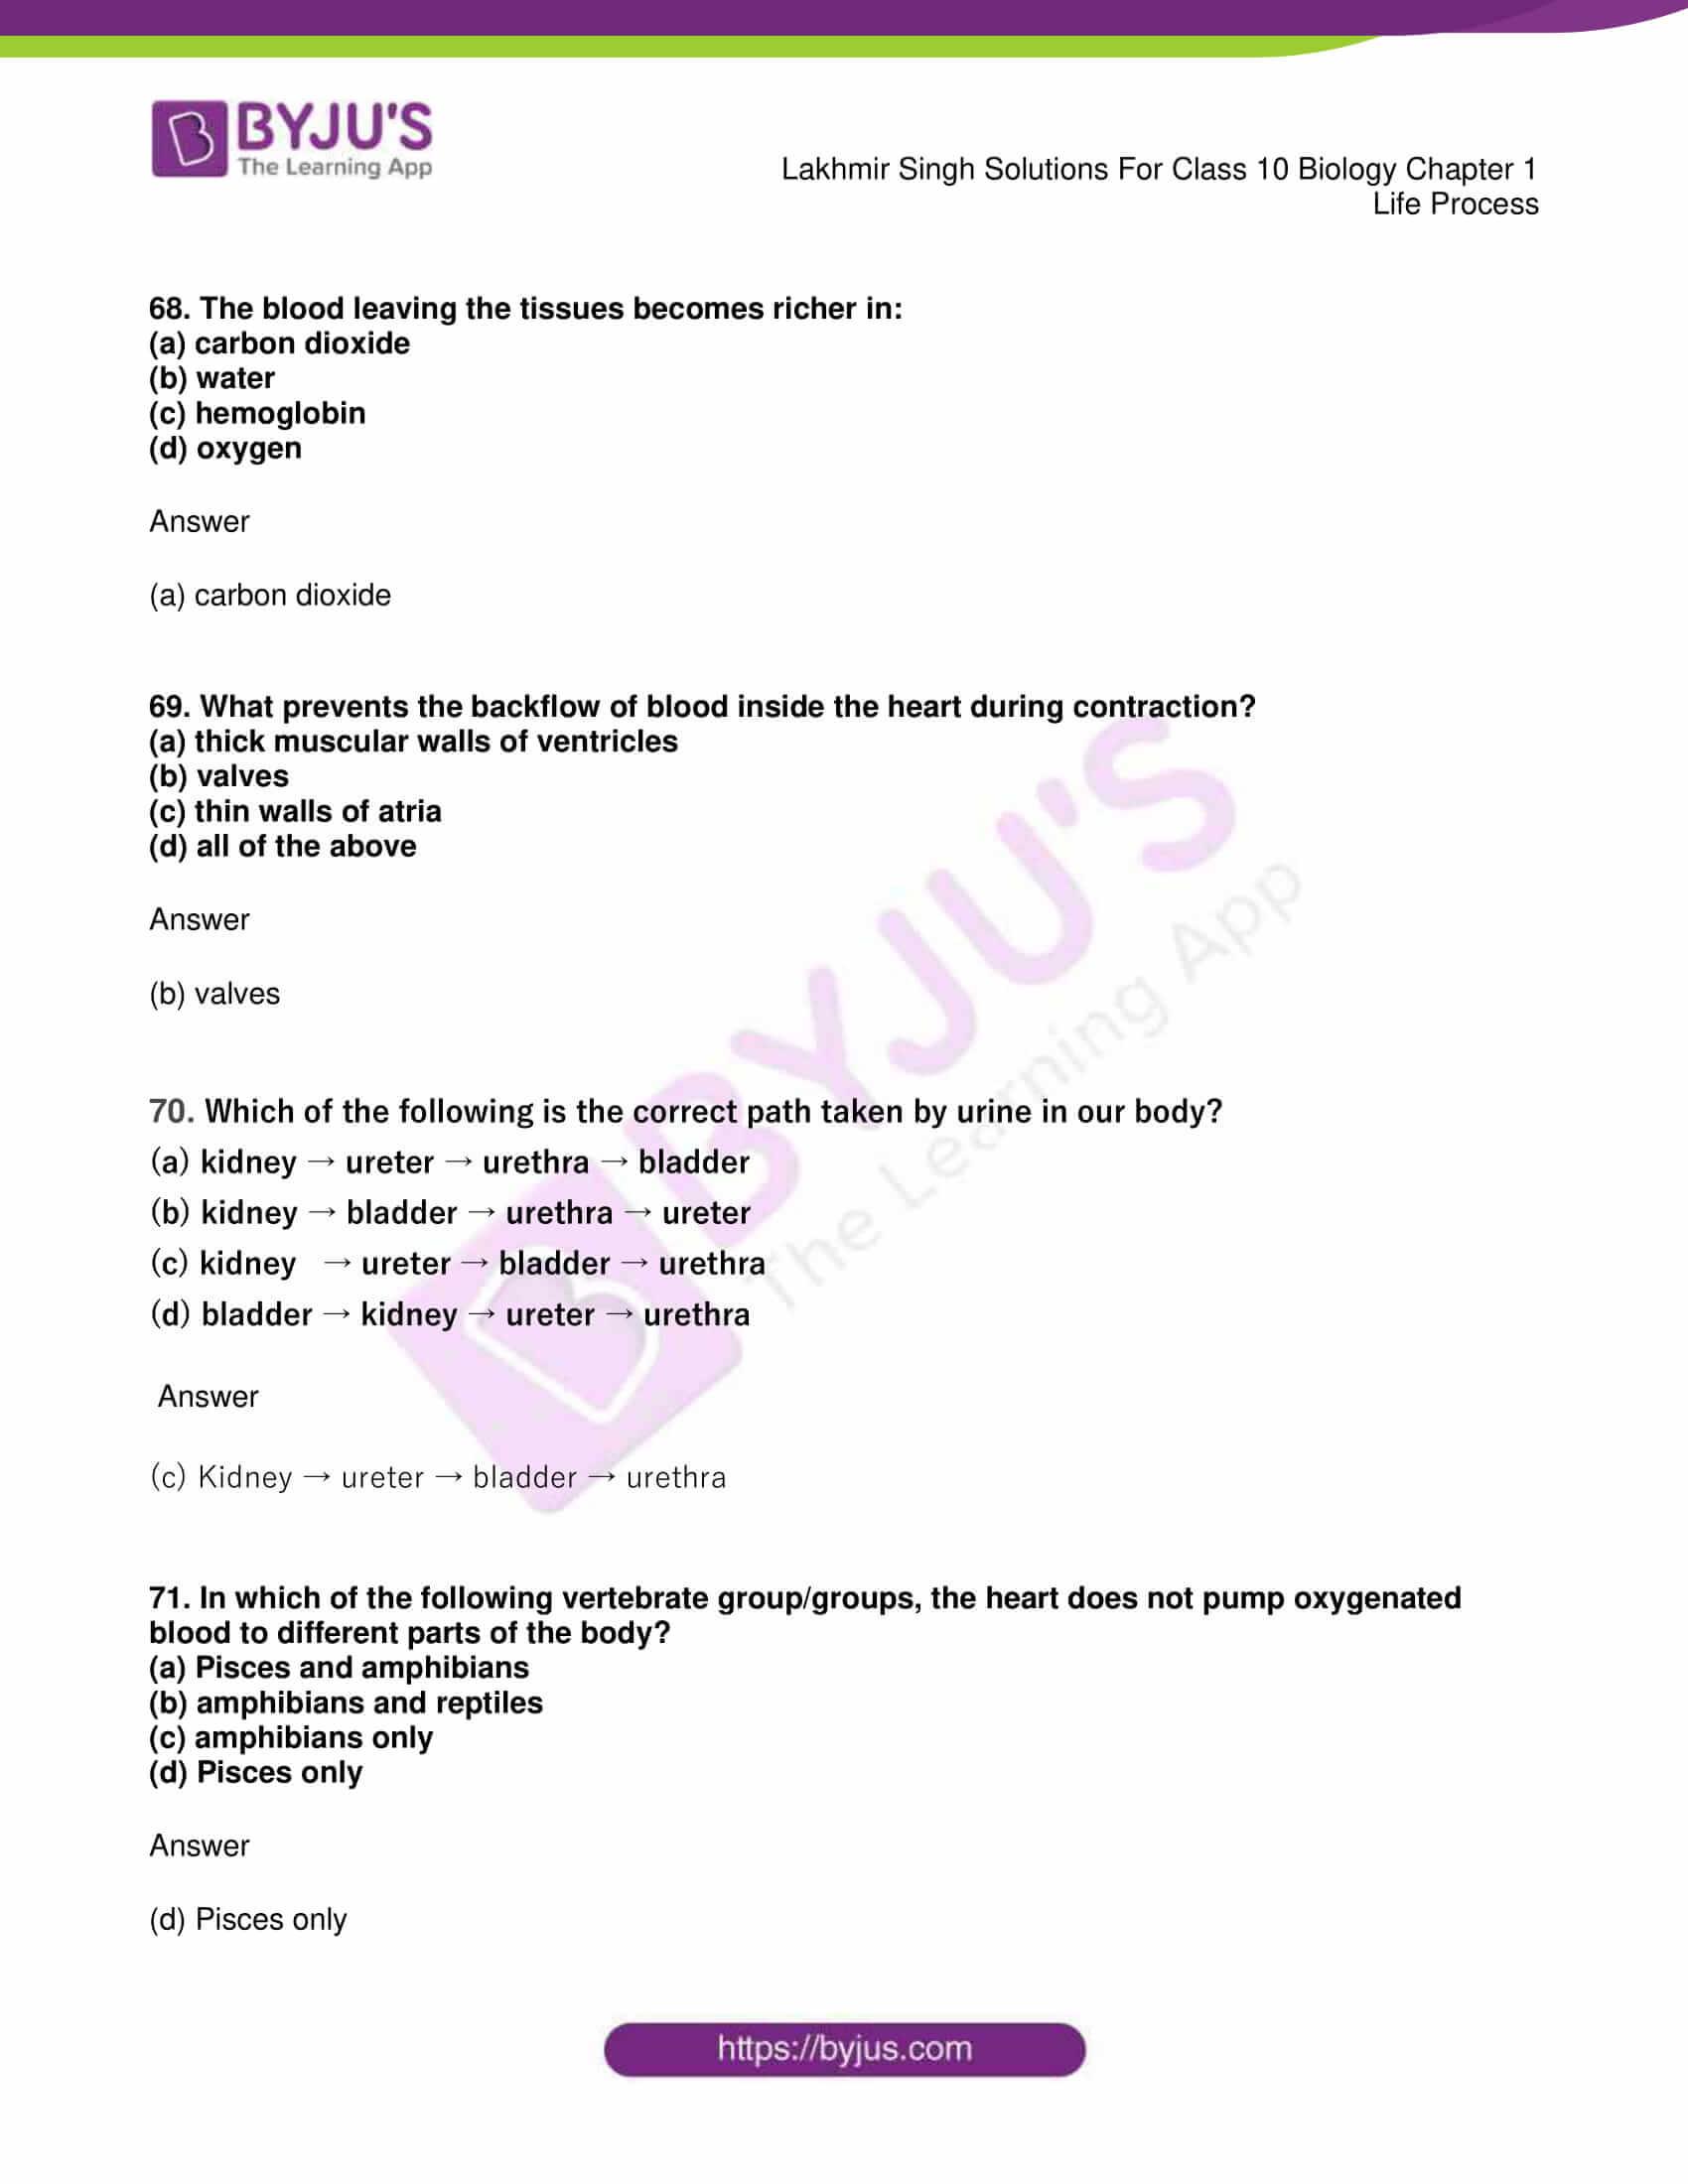 lakhmir singh sol class 10 biology chapter 1 83